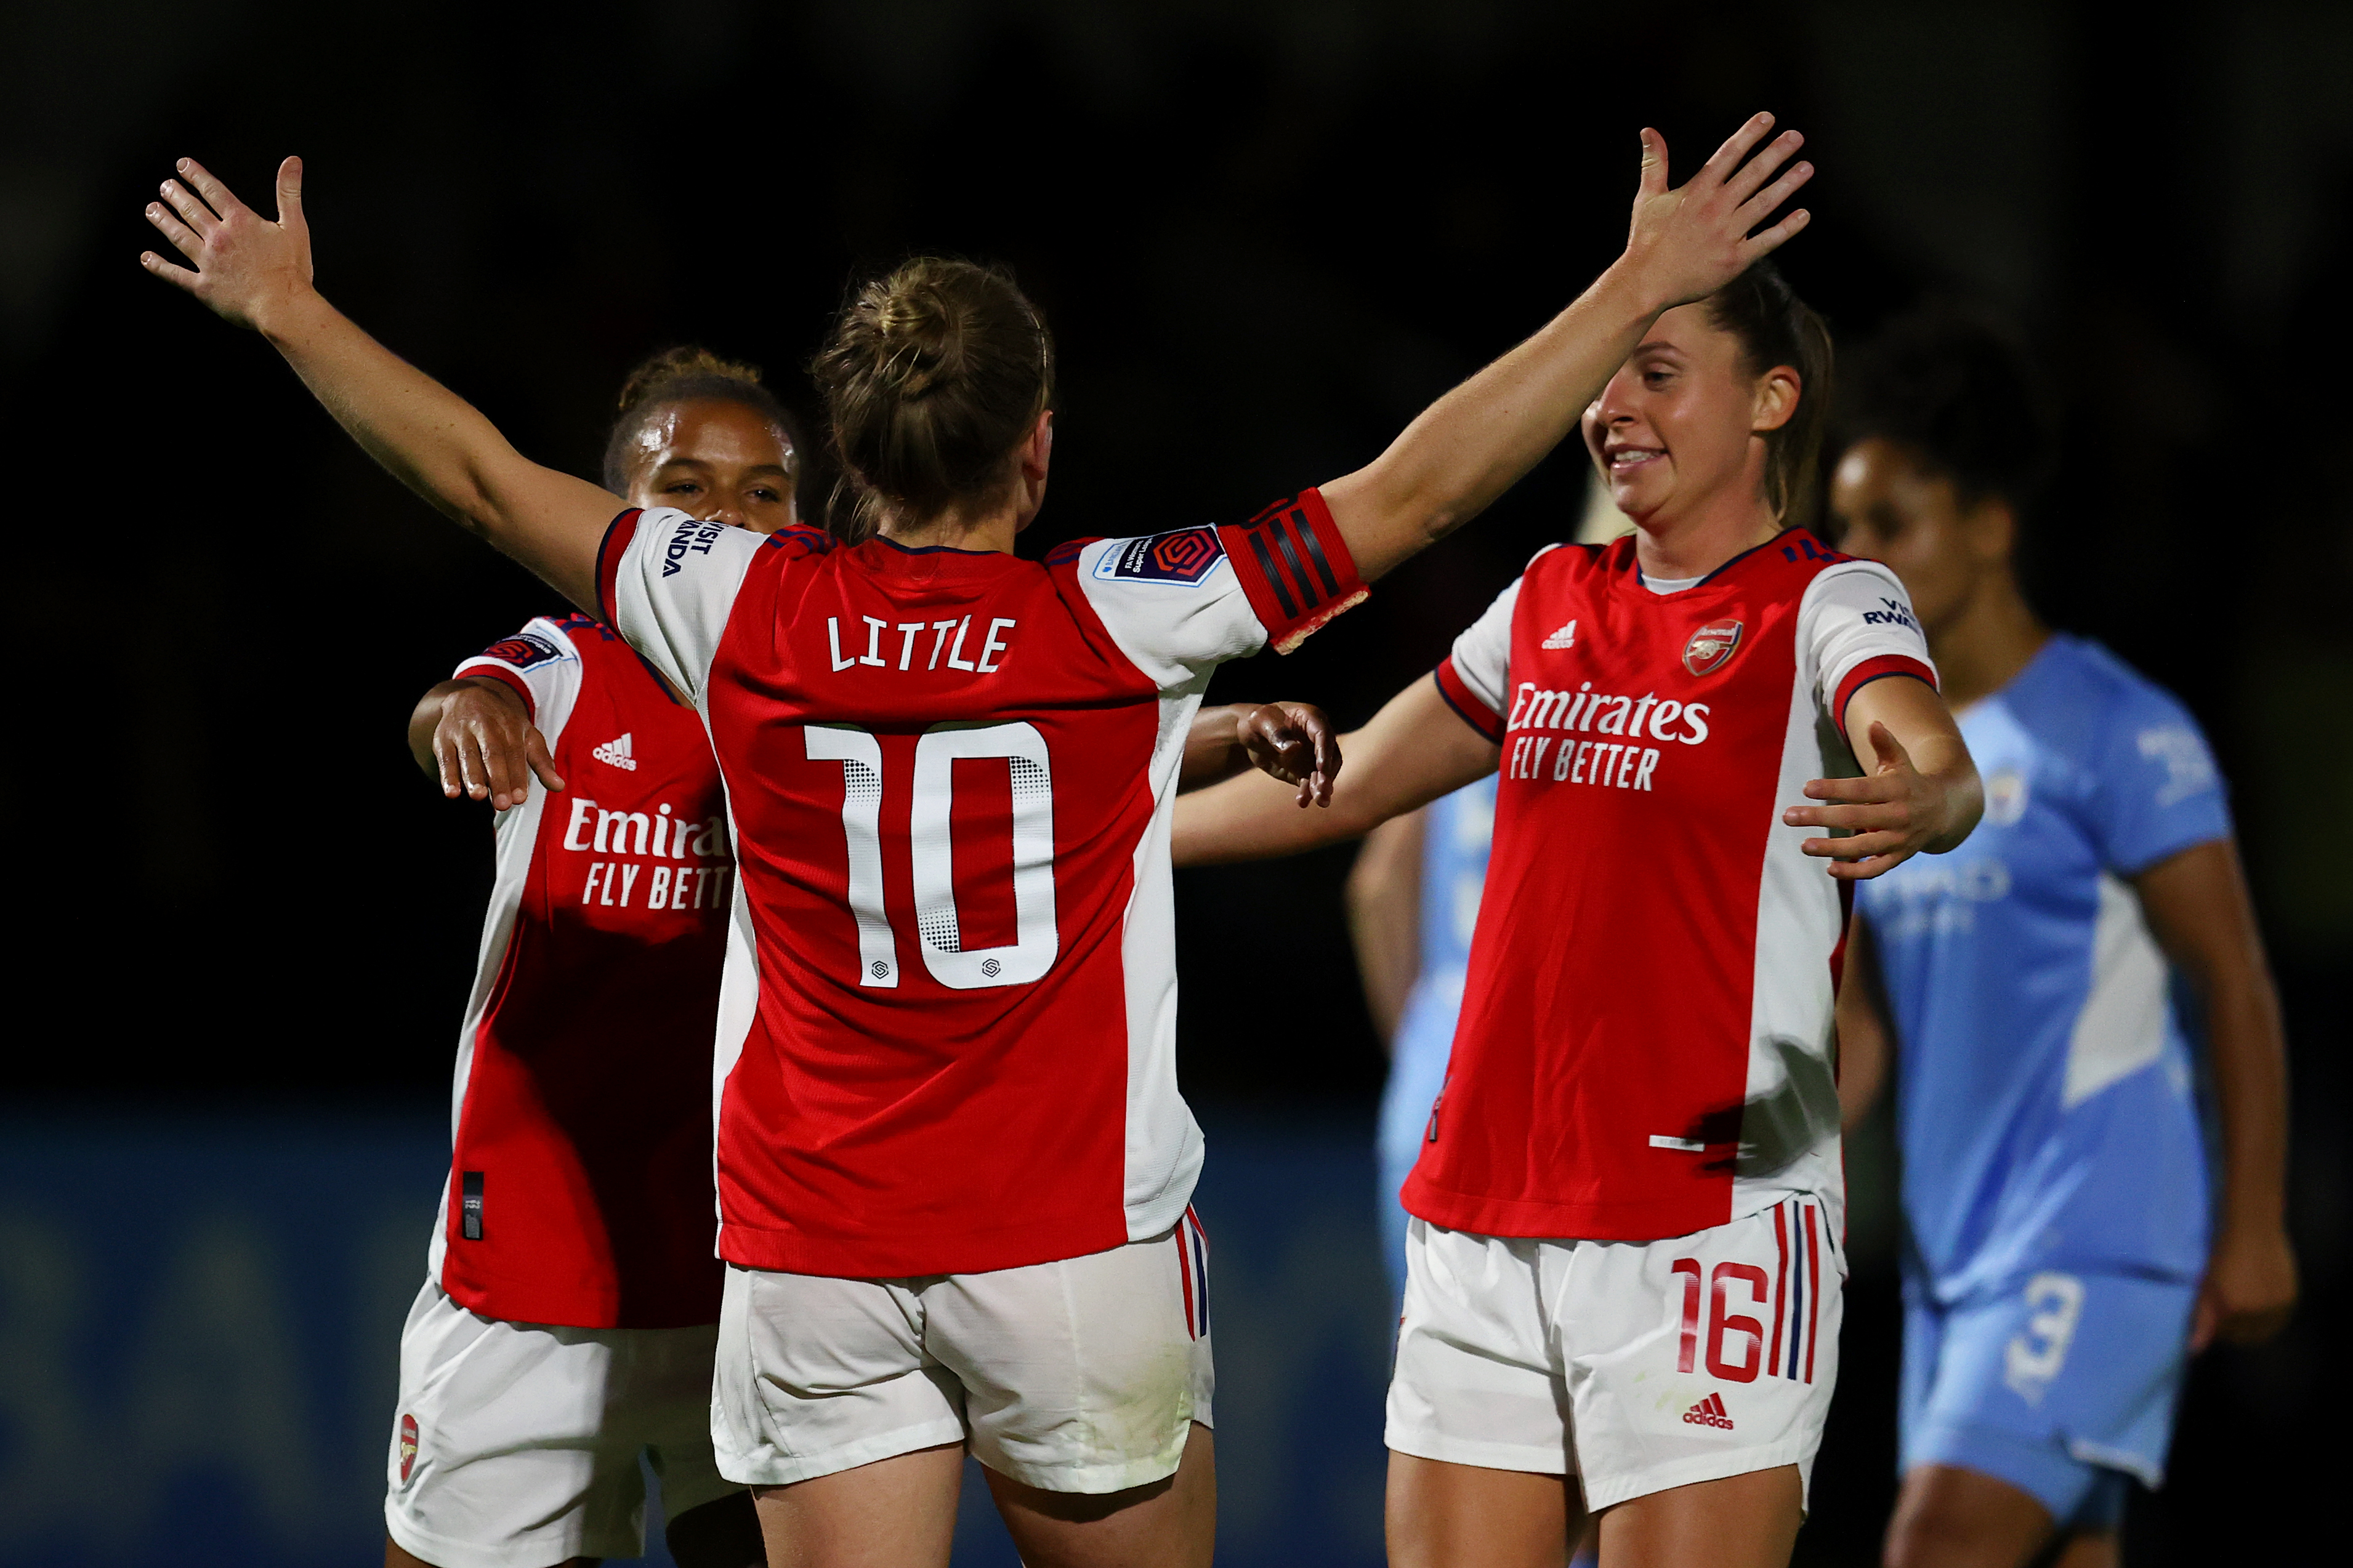 Arsenal Women v Manchester City Women - Barclays FA Women's Super League